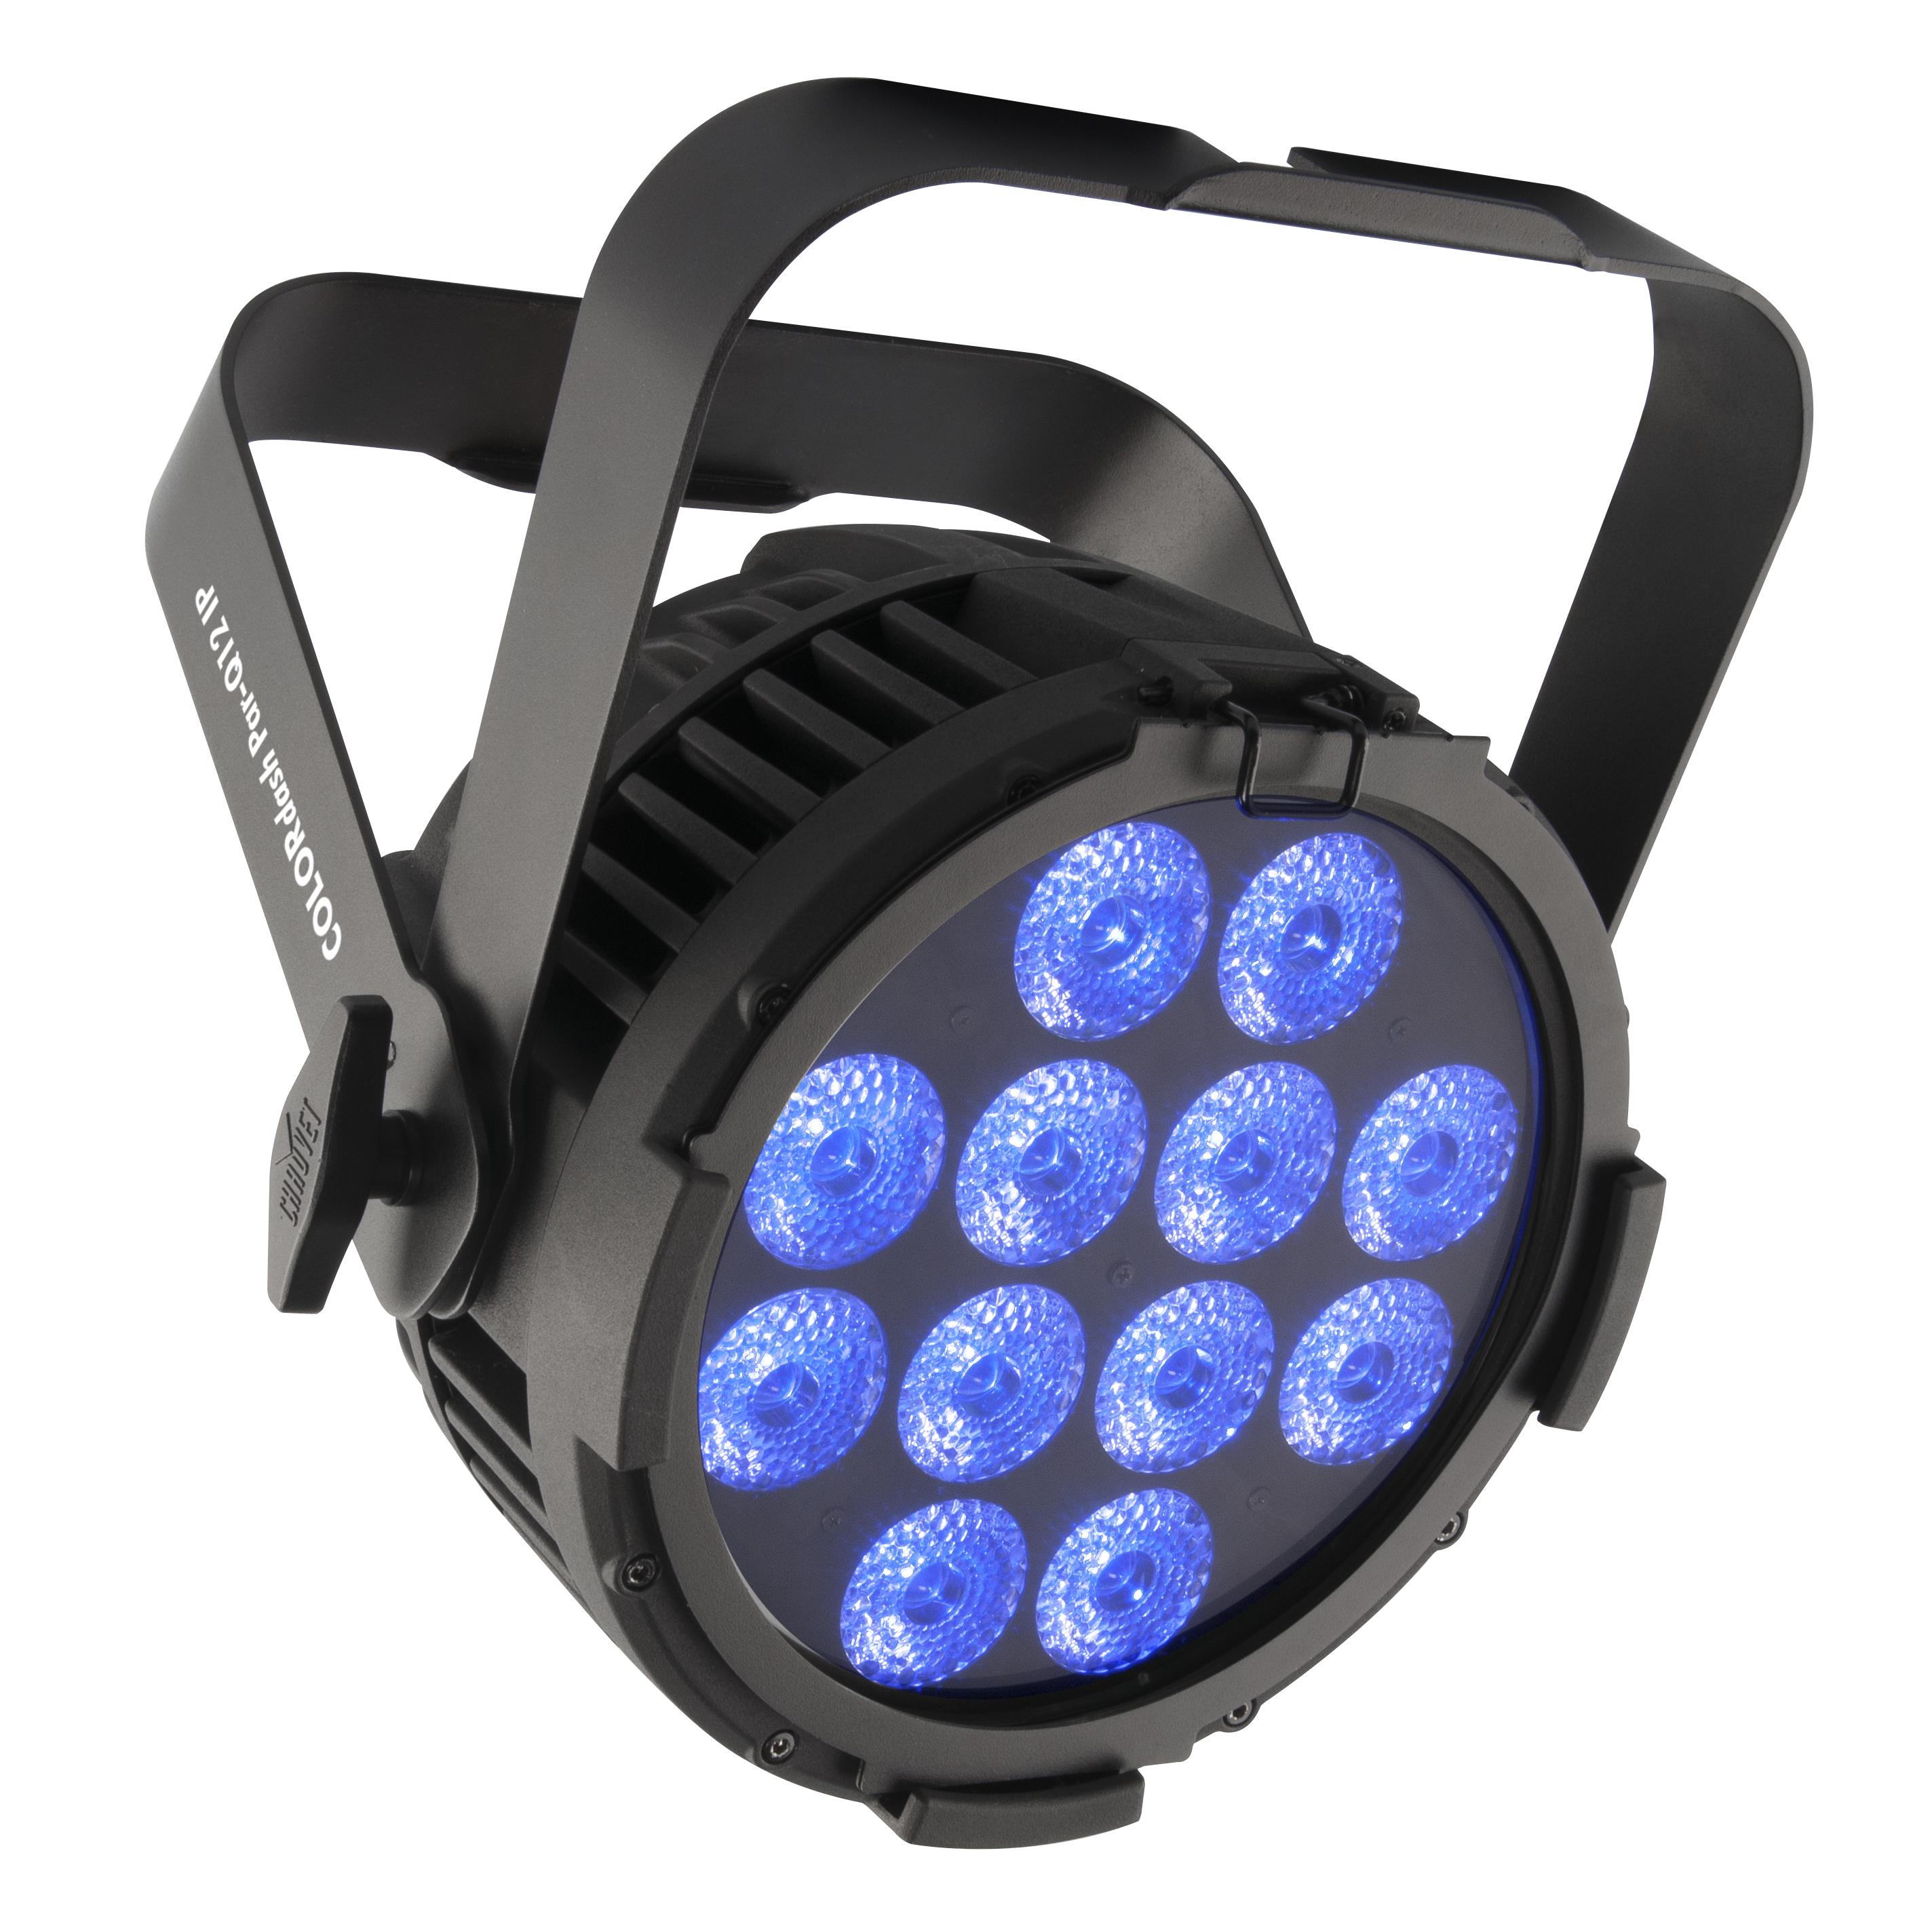 Weatherproof Lighting